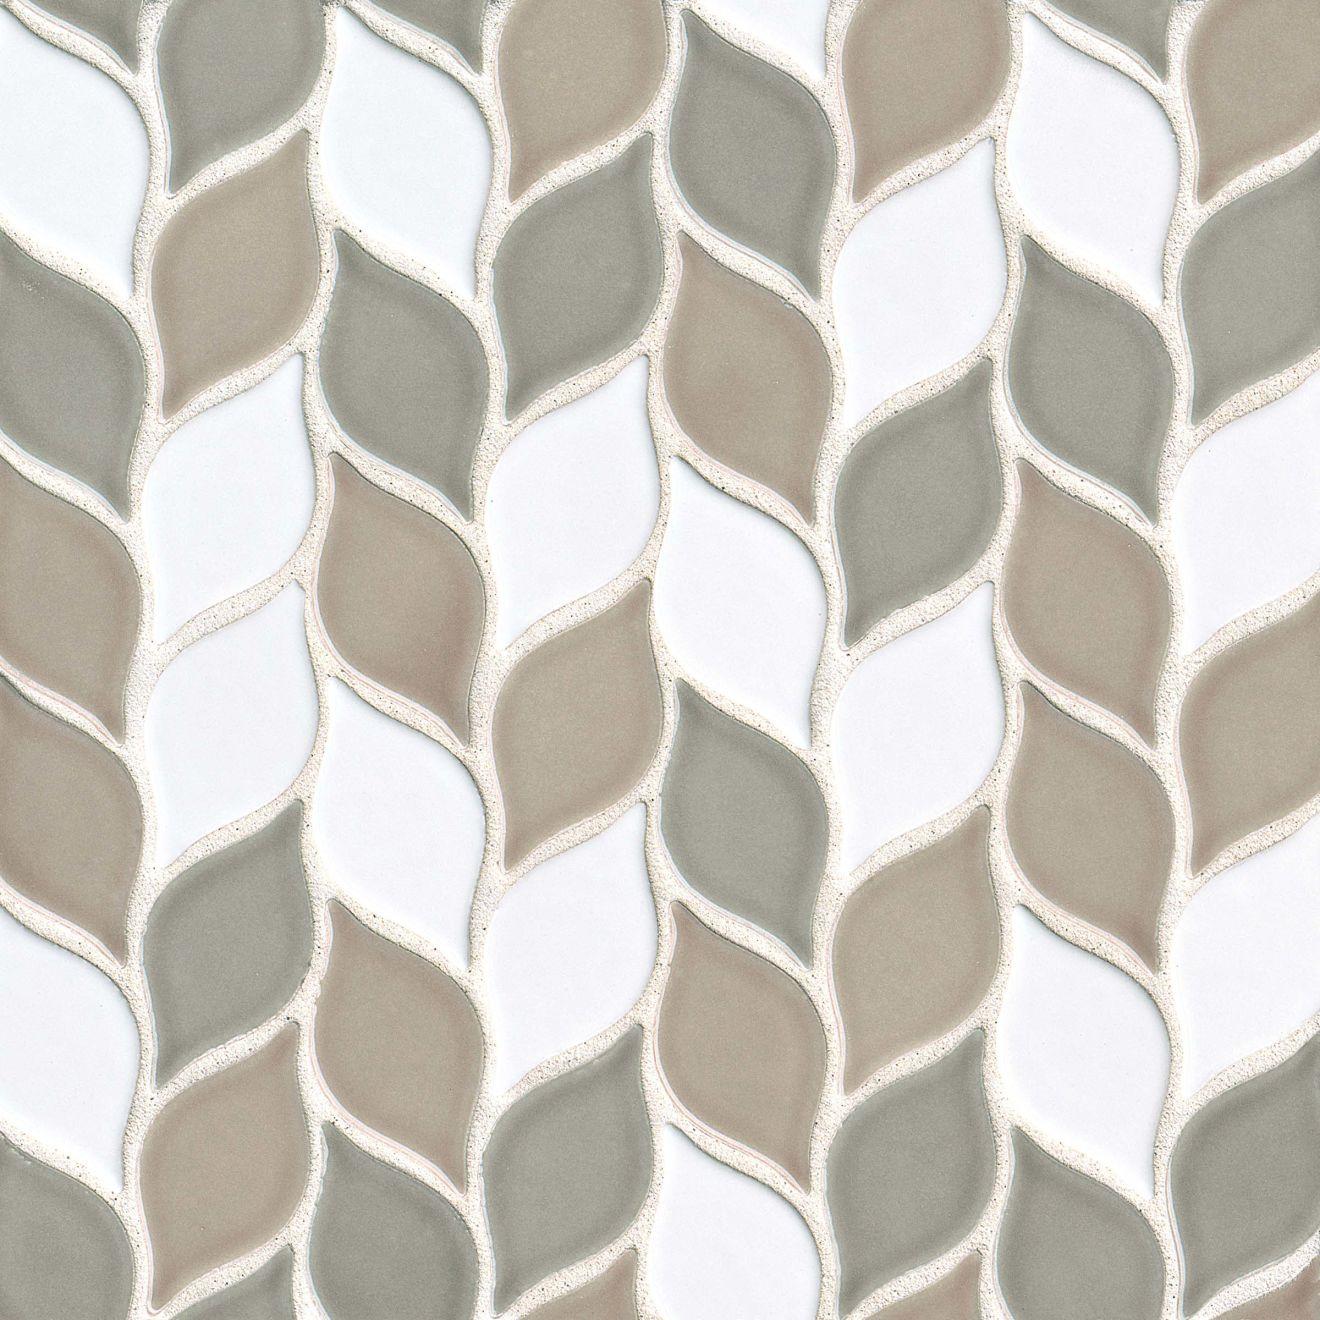 "Provincetown 2-13/16"" x 1-7/16"" Floor & Wall Mosaic in Beech Forest Blend"